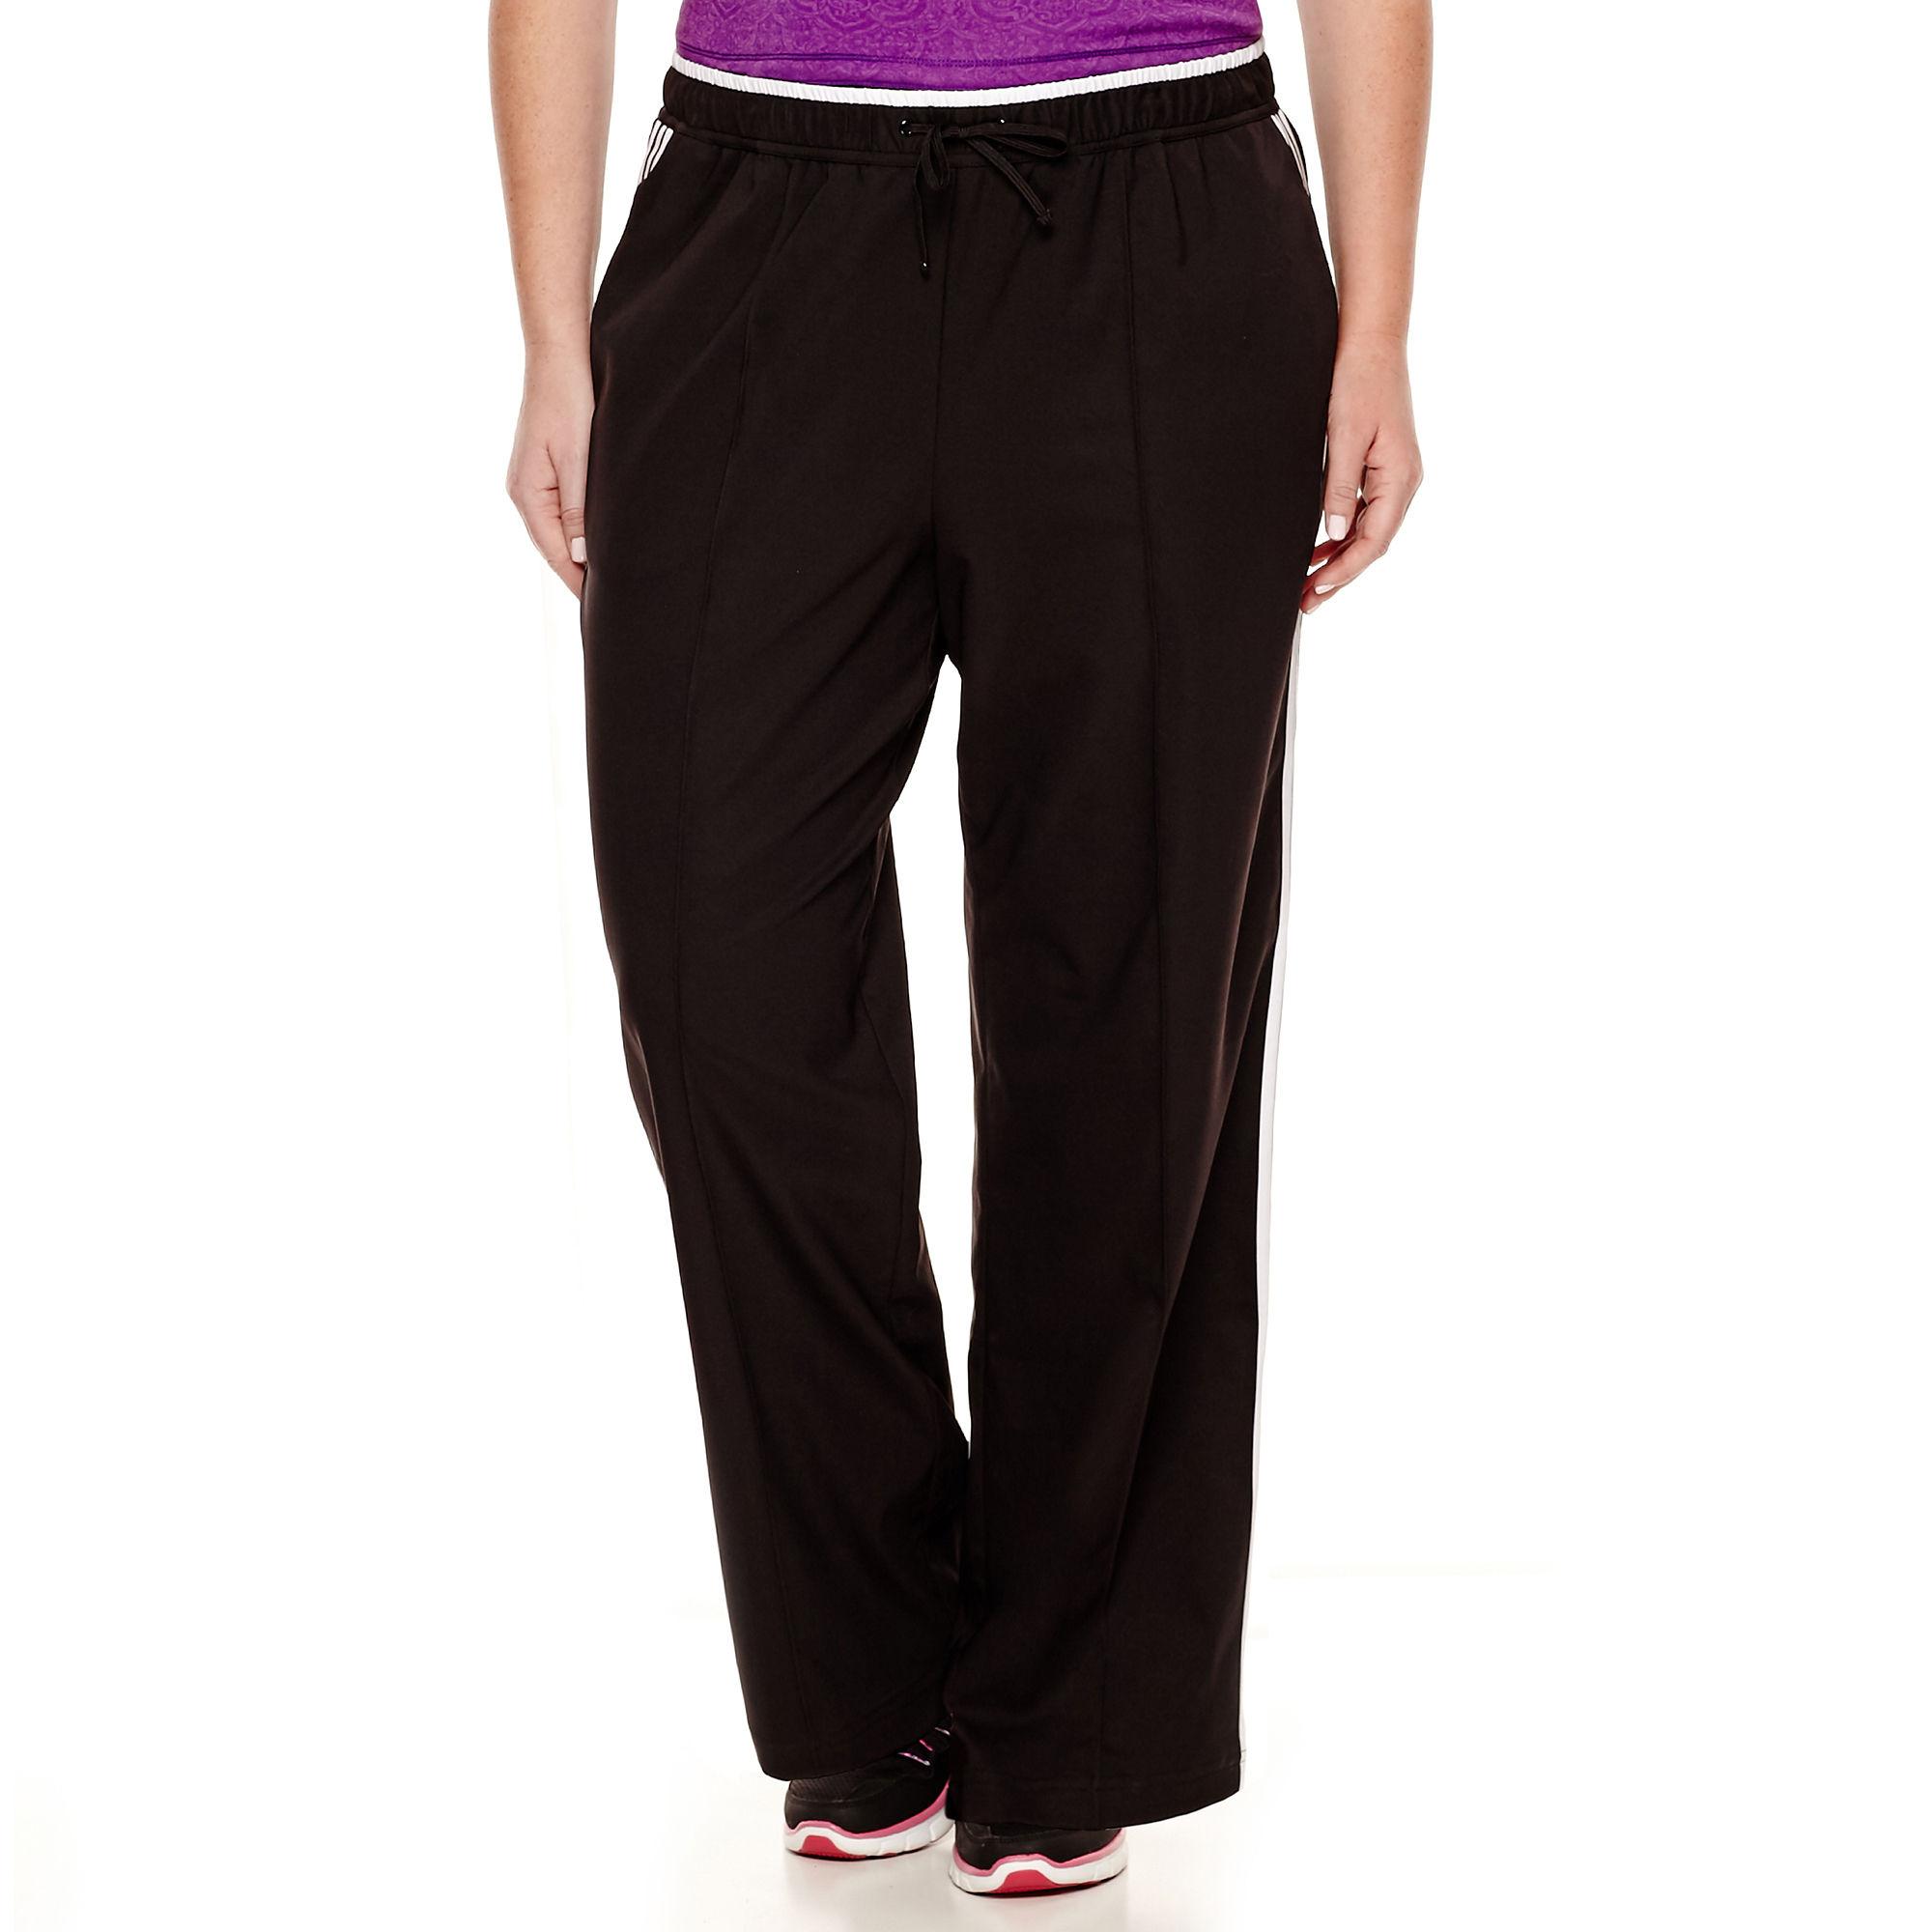 Made For Life™ Woven PIntuck Pants - Plus